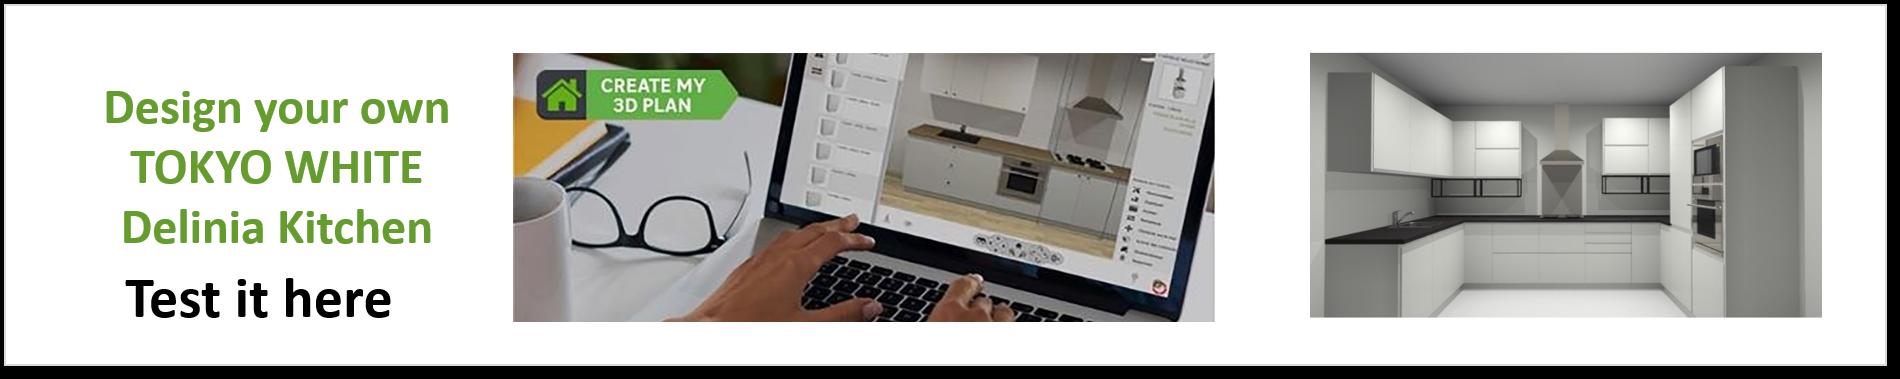 Create or Design your own Delinia Tokyo White Designer Kitchen